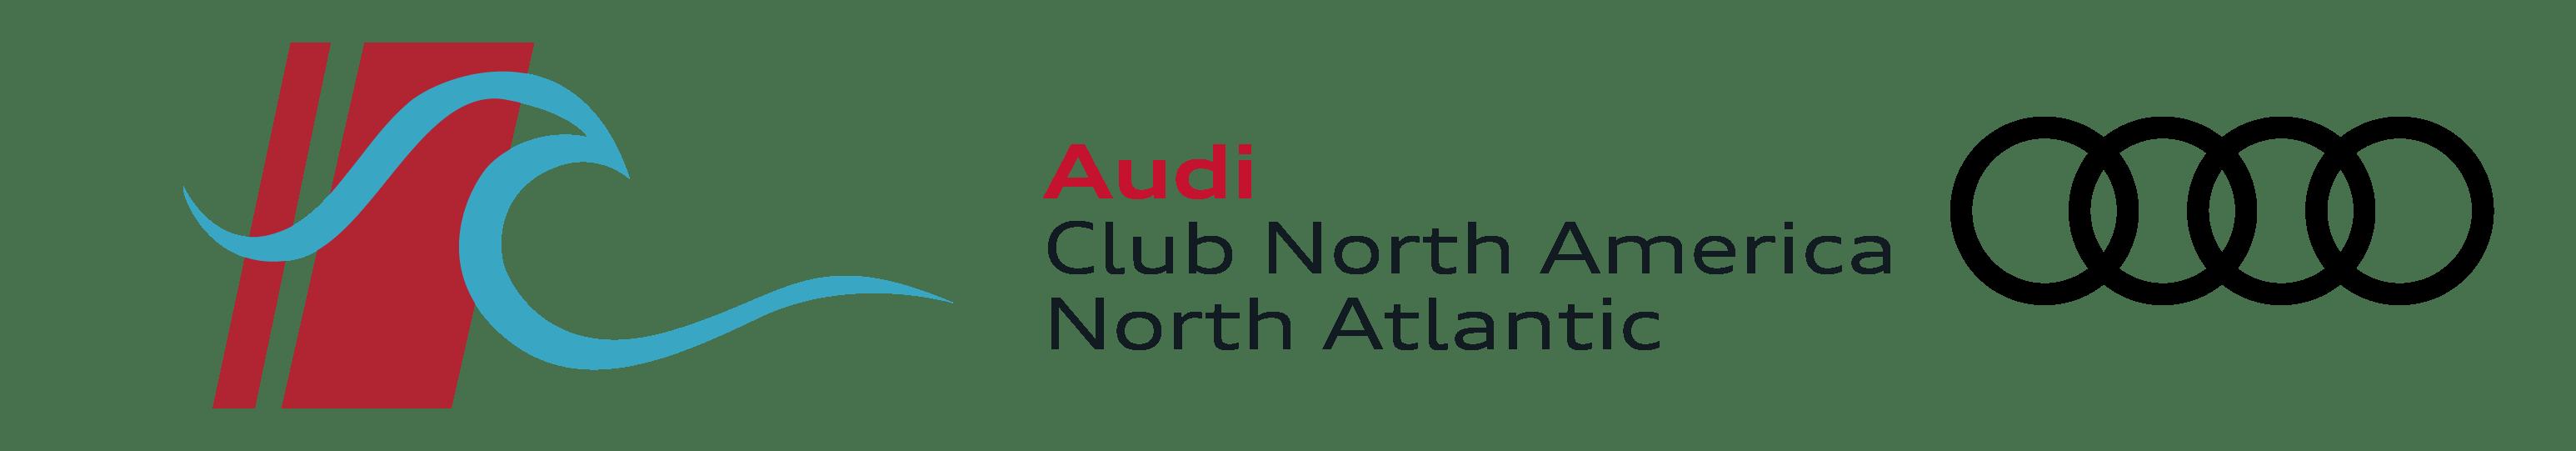 Audi Club of North America - North Atlantic Chapter